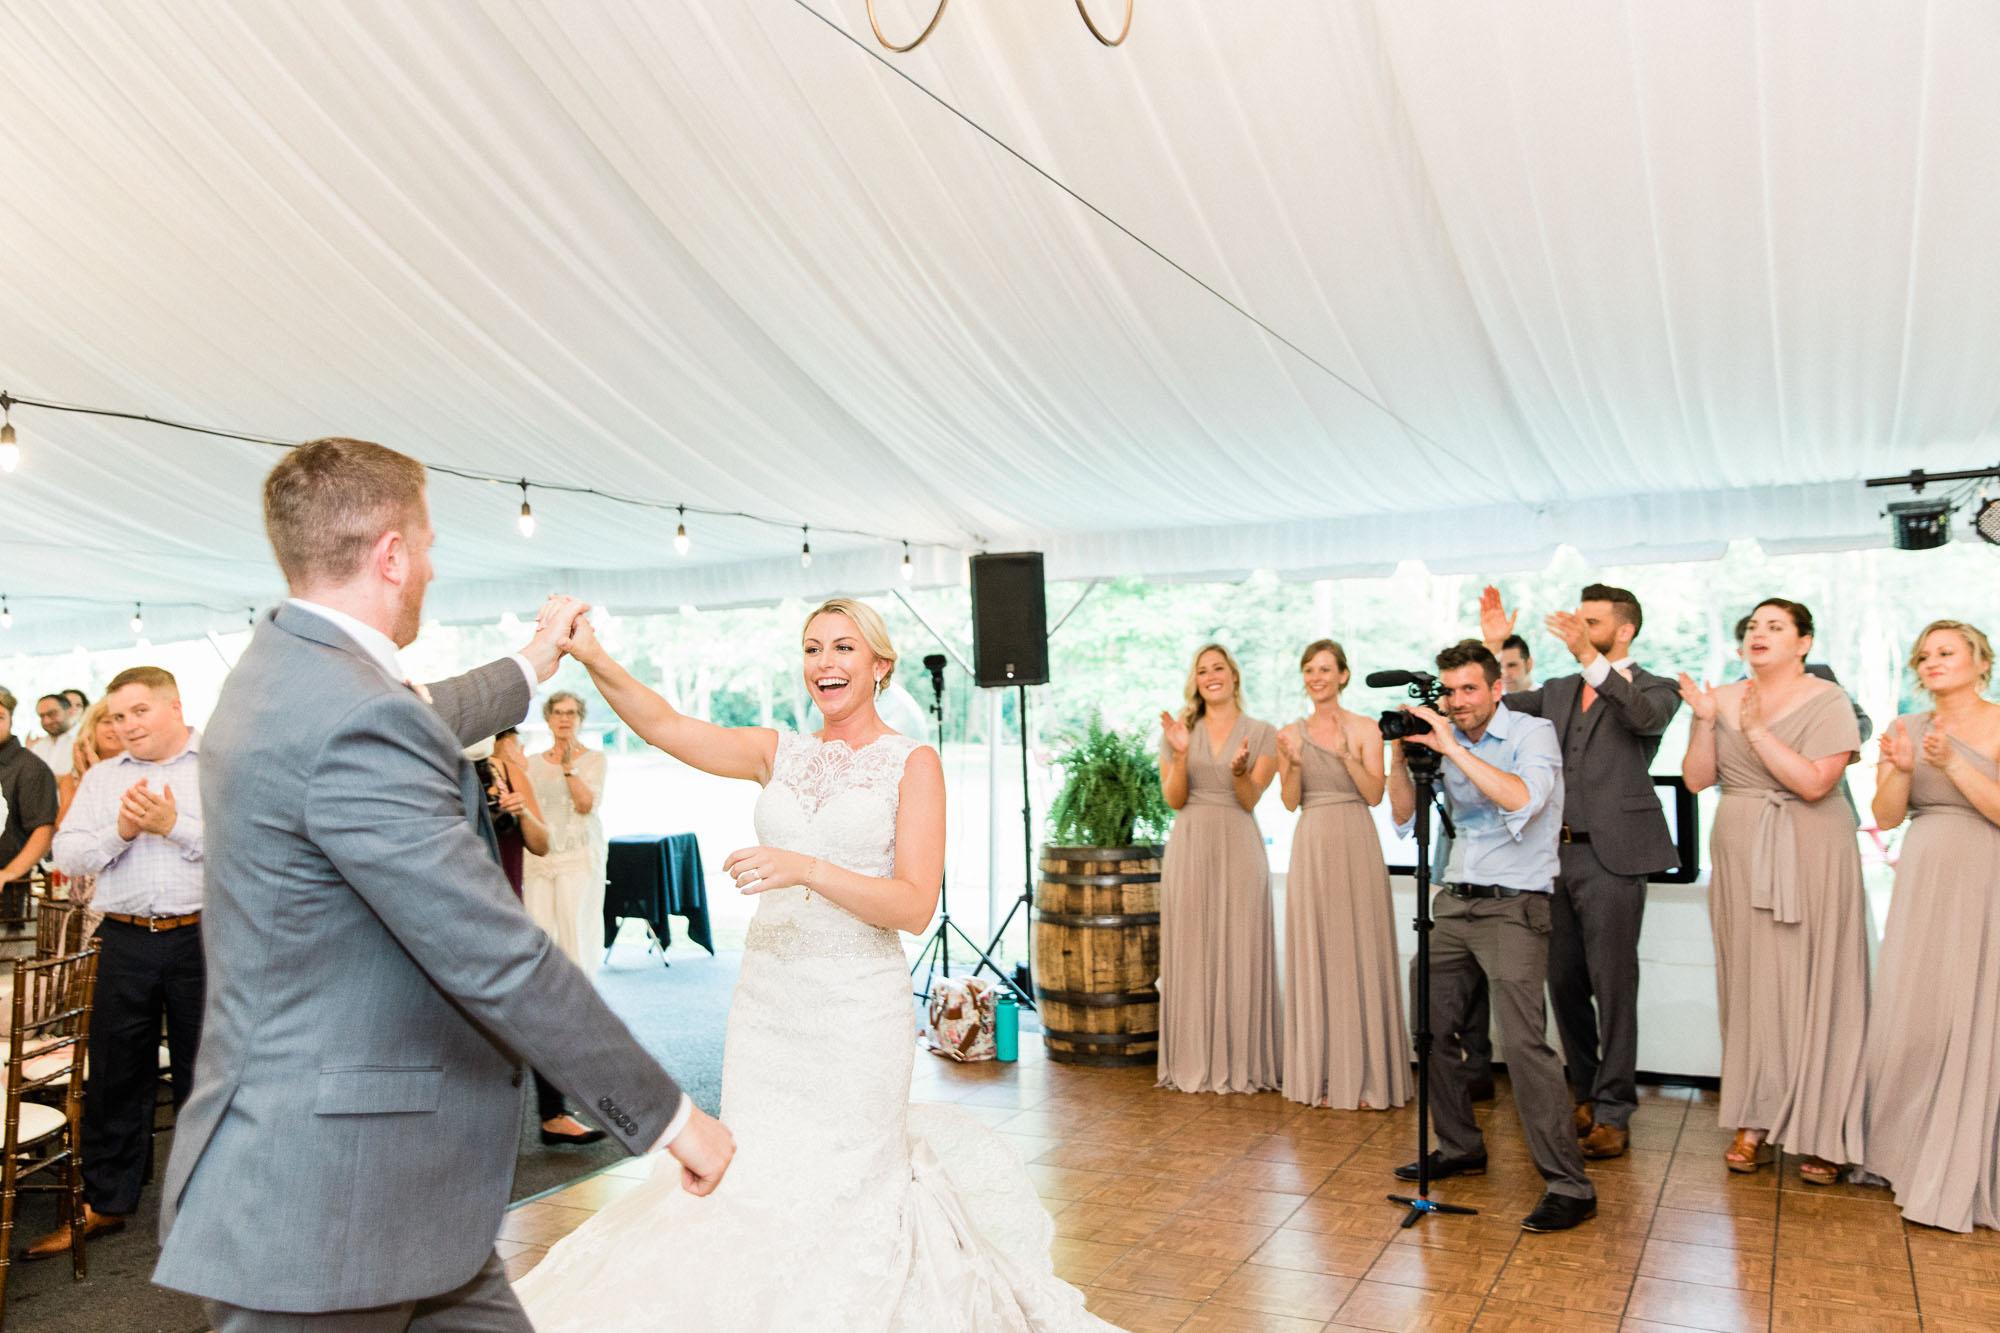 Allenberry-resort-historic-pennsylvania-wedding-10375.jpg